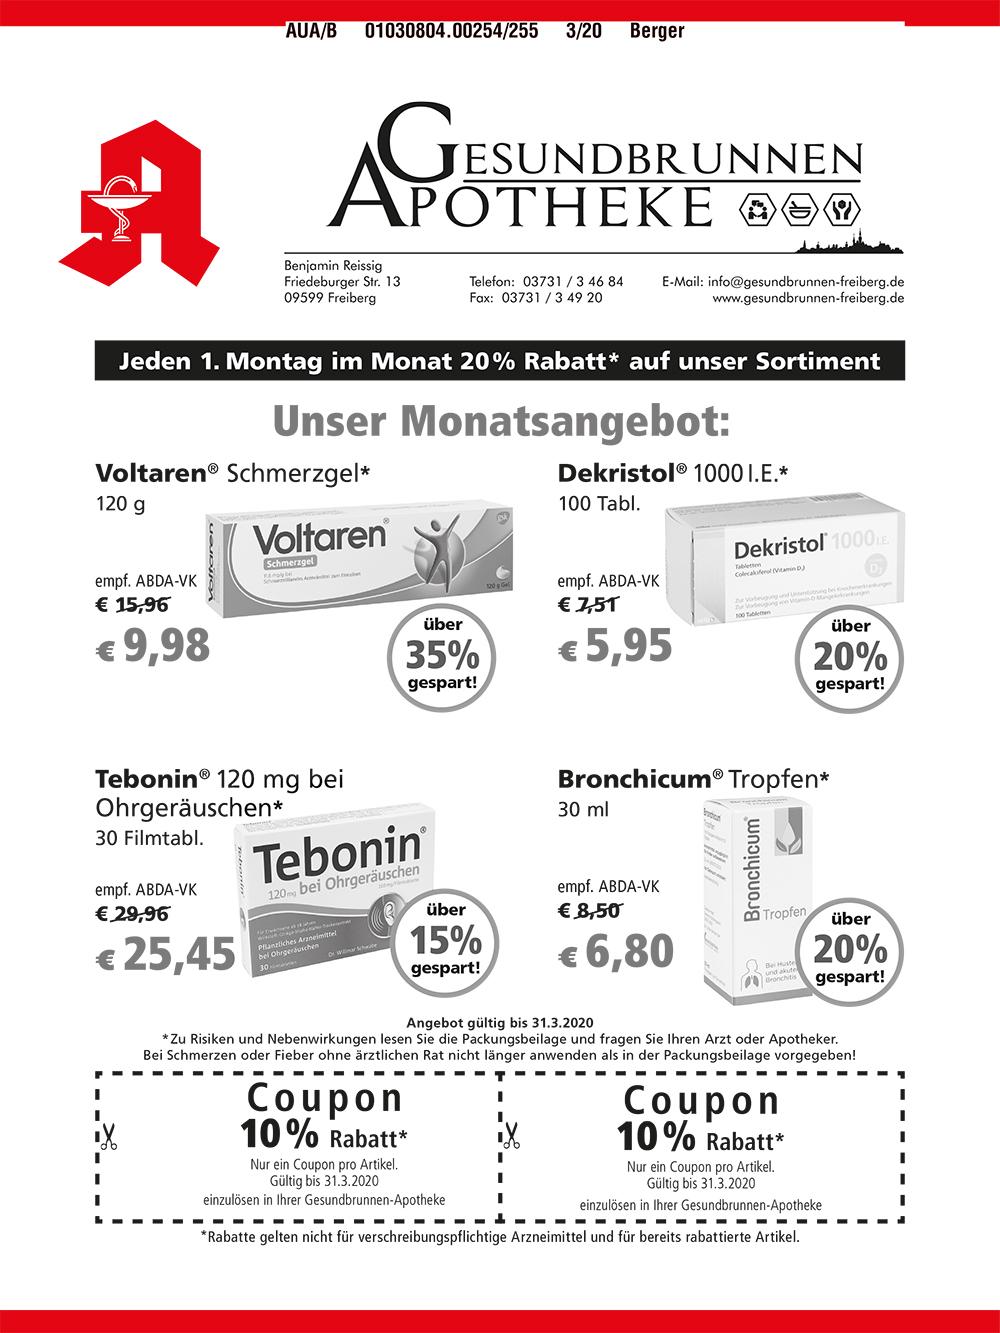 http://www.apotheken.de/fileadmin/clubarea/00000-Angebote/09599_16486_gesundbrunnen_angebot_1.jpg